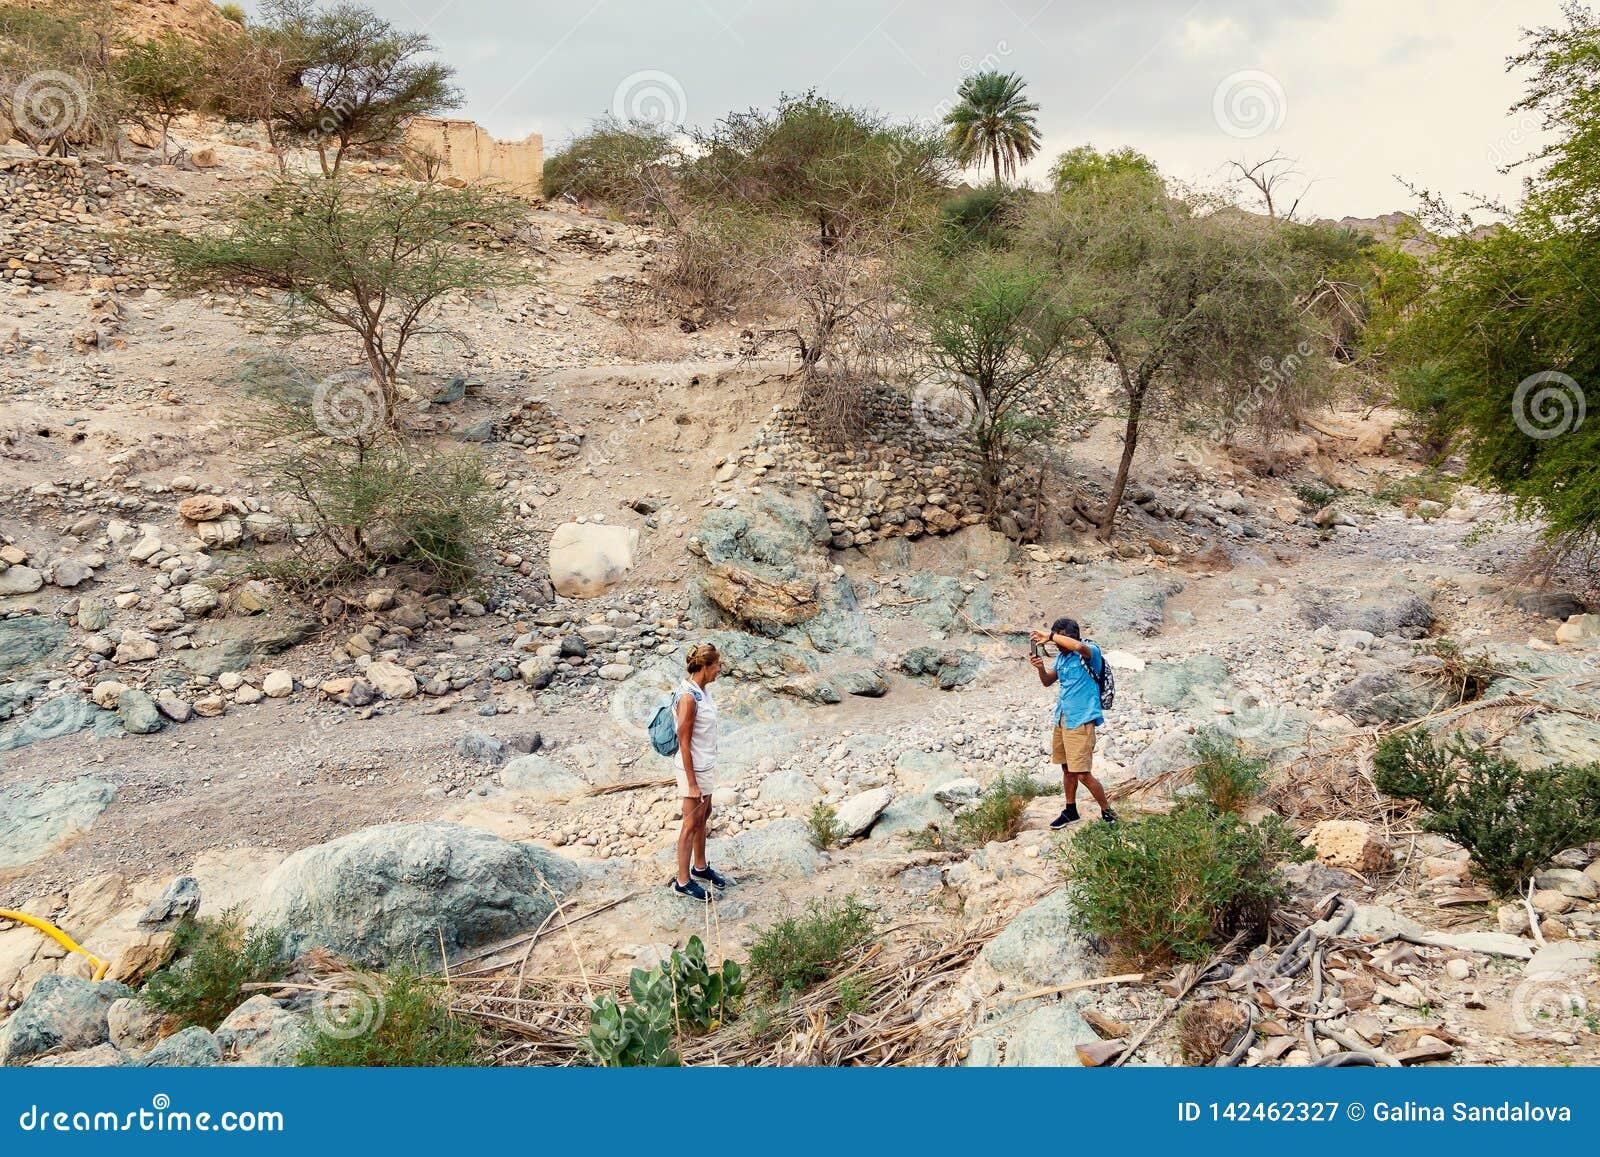 Muscat, Ομάν - 16 Δεκεμβρίου 2018: οι τουρίστες παίρνουν τις εικόνες στο wadi - ξηρά κοίτη ποταμού - στα περίχωρα Muscat